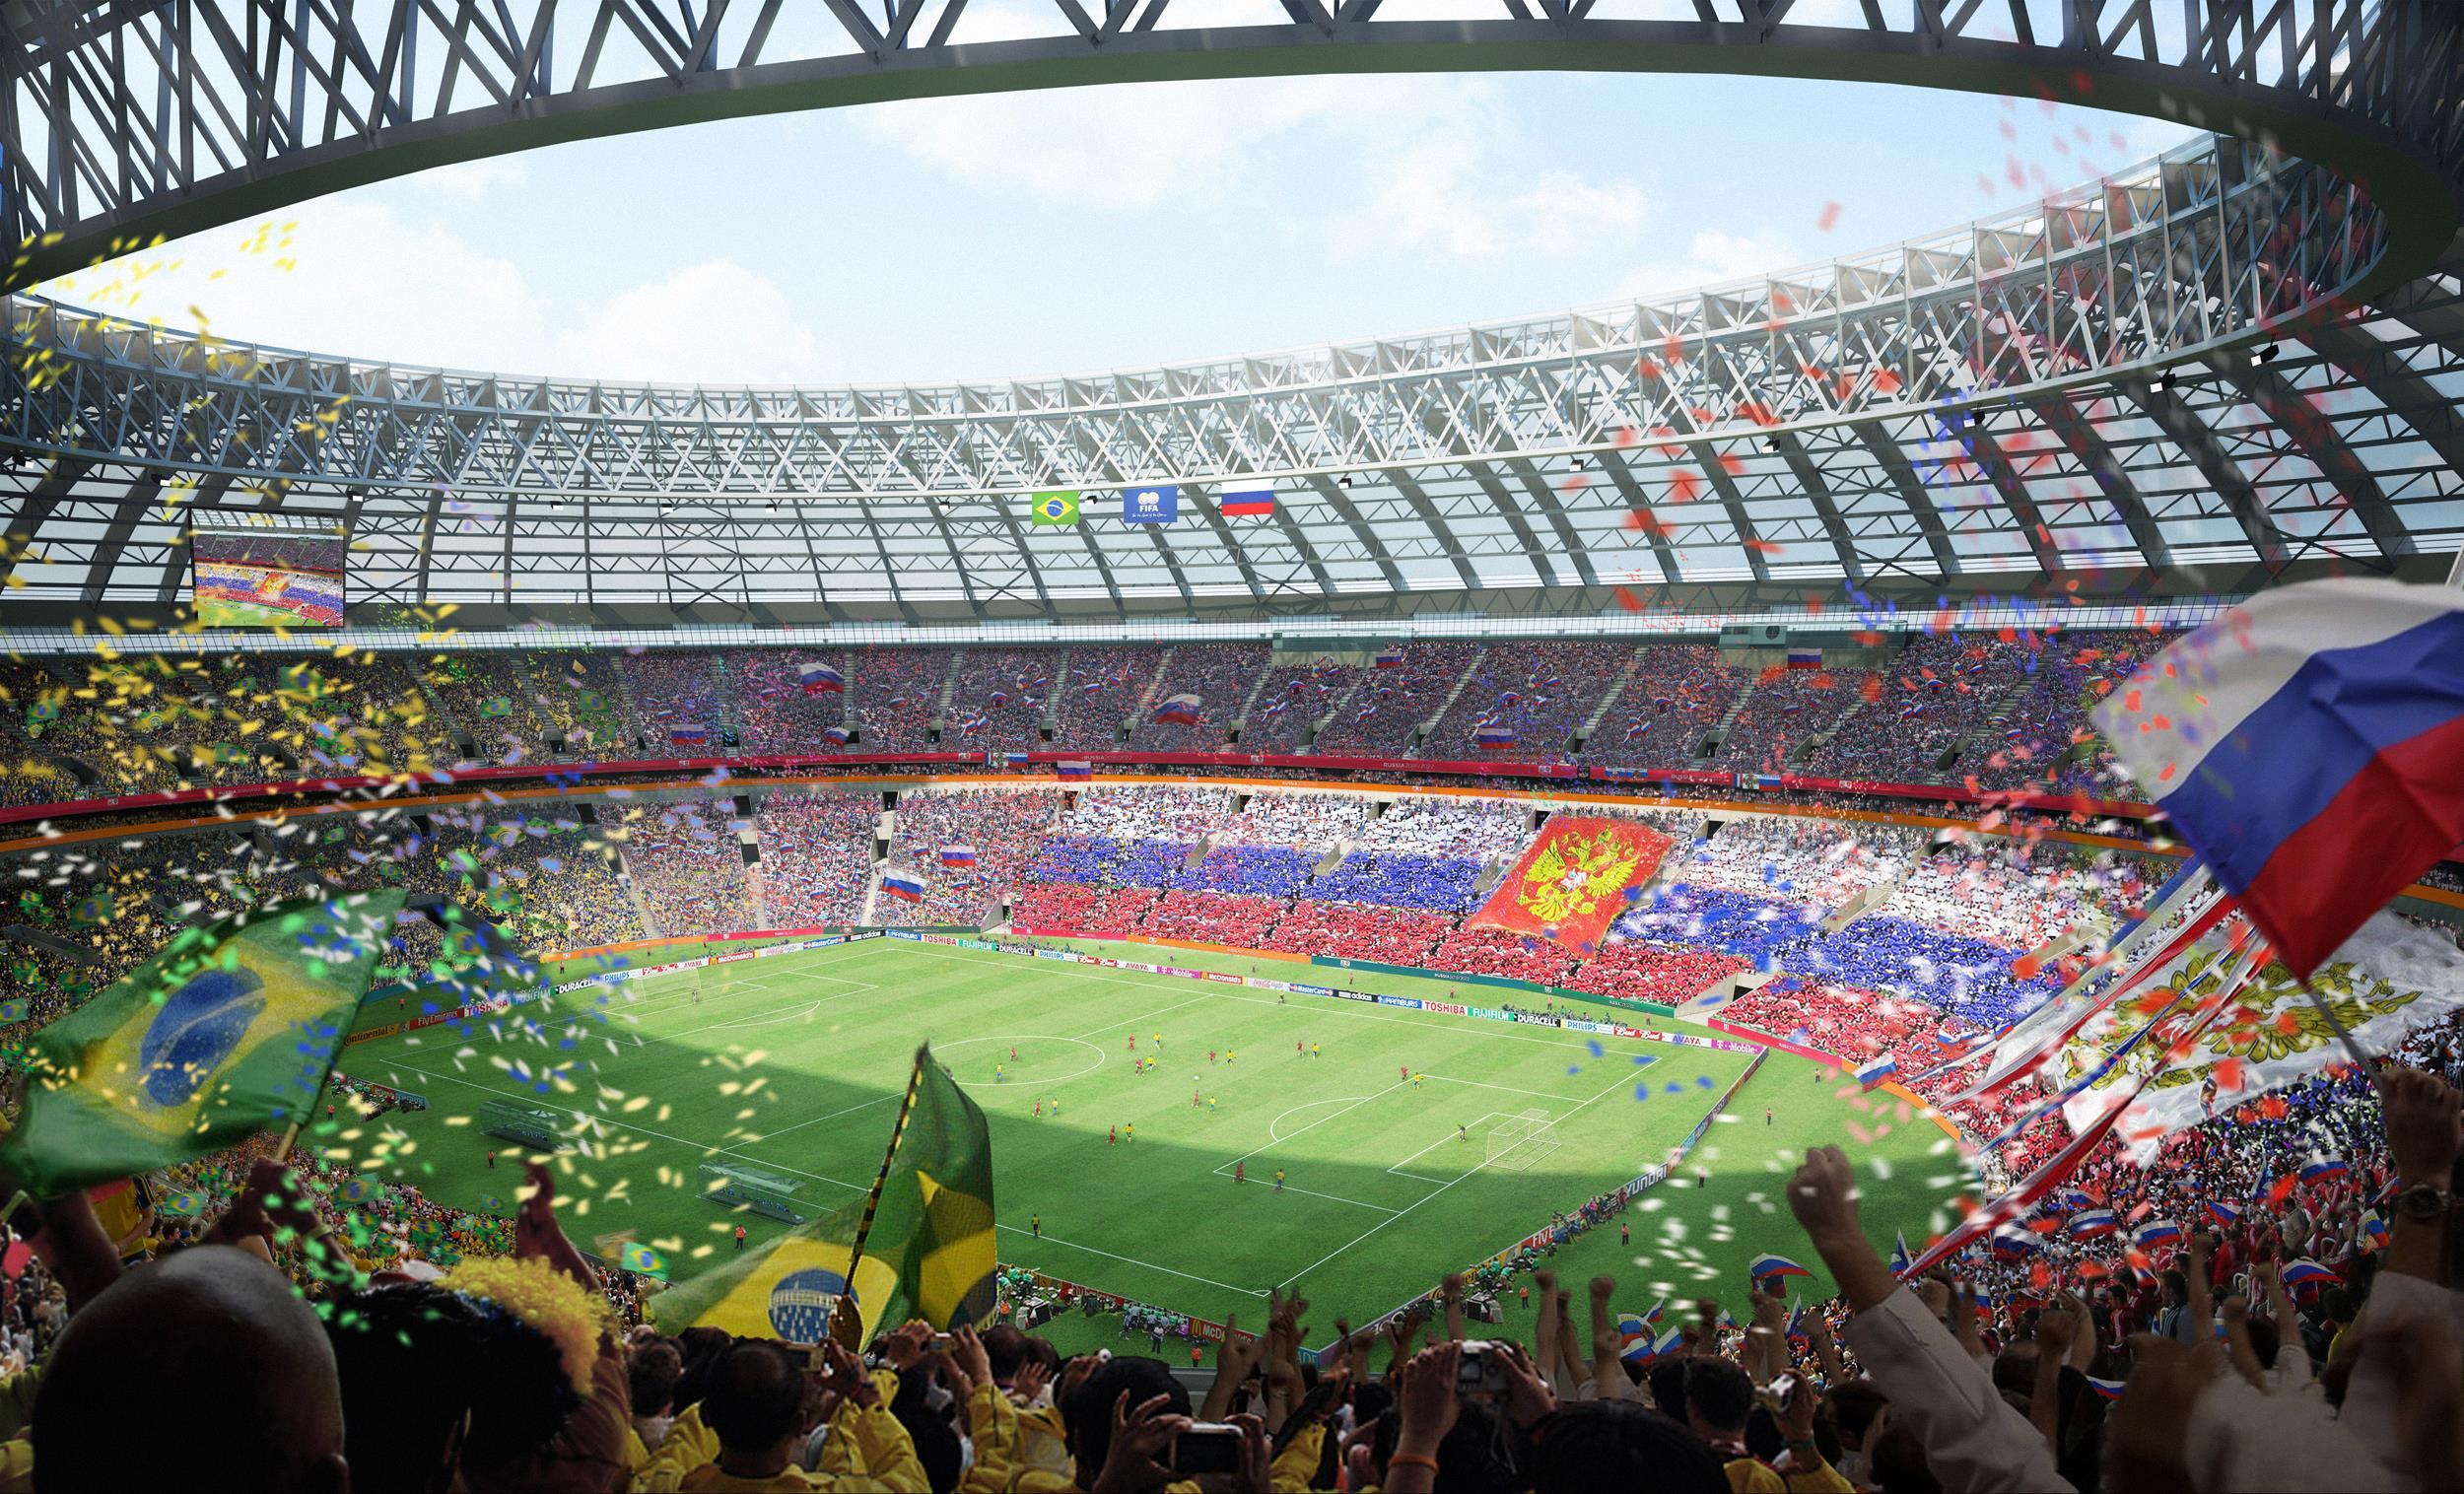 Wwe Dx Hd Wallpaper World Cup Russia 2018 Wallpaper